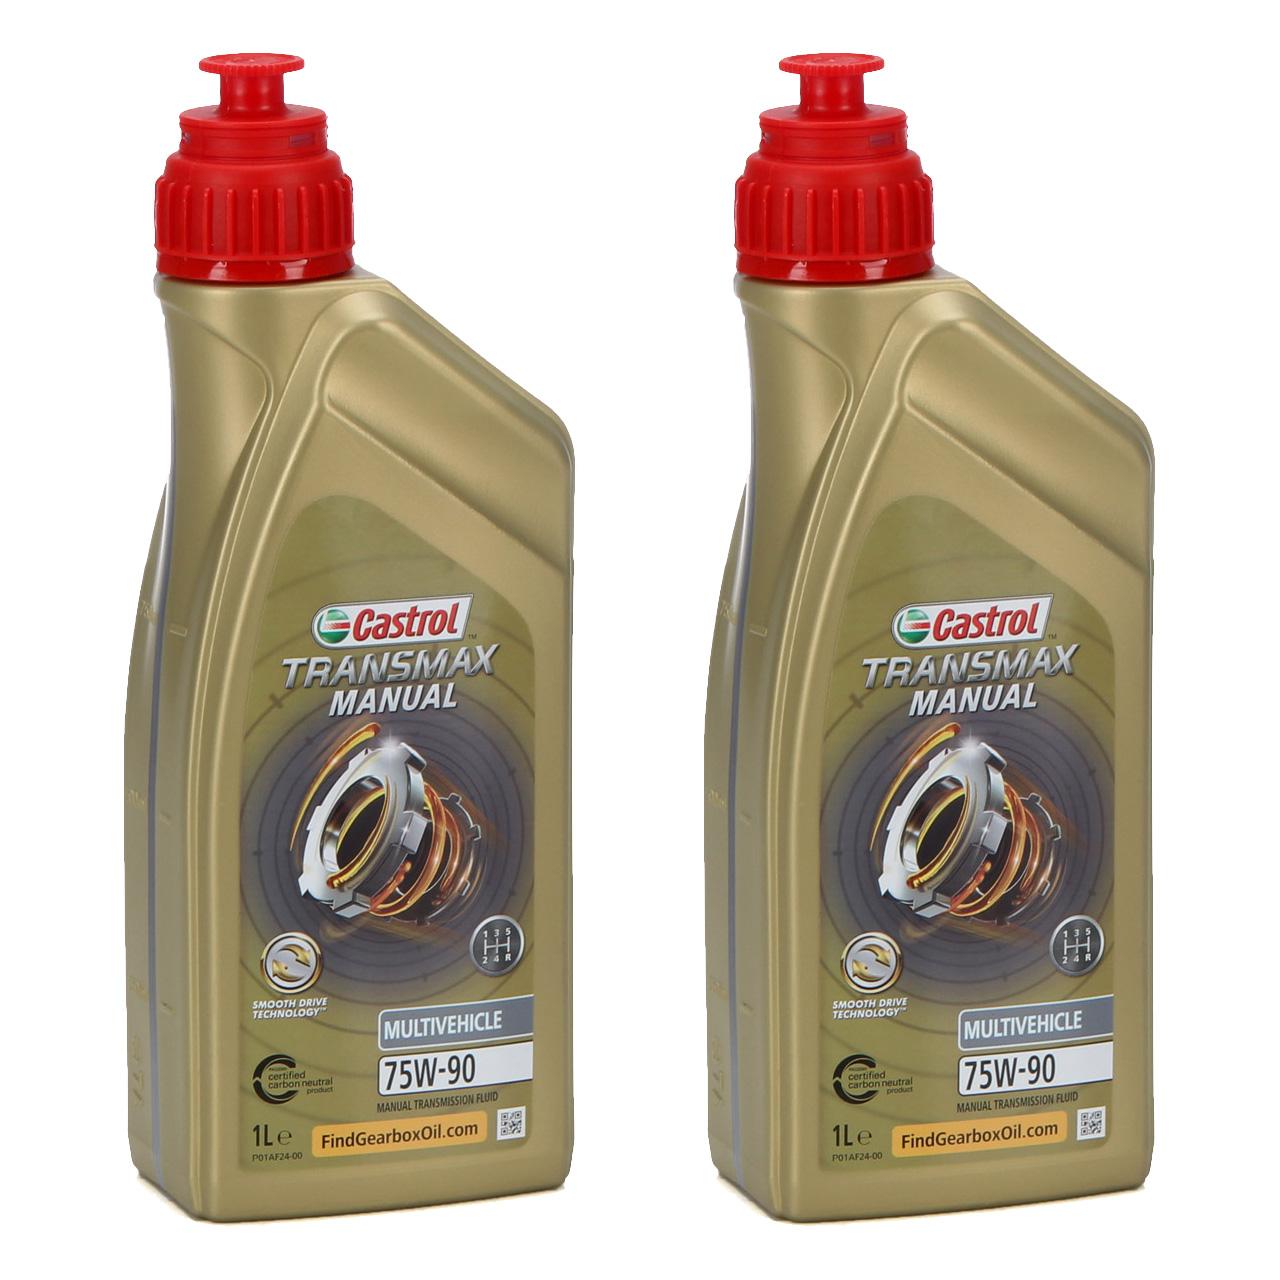 2L 2 Liter CASTROL Schaltgetriebeöl TRANSMAX MANUAL MULTIVEHICLE 75W-90 API GL-4